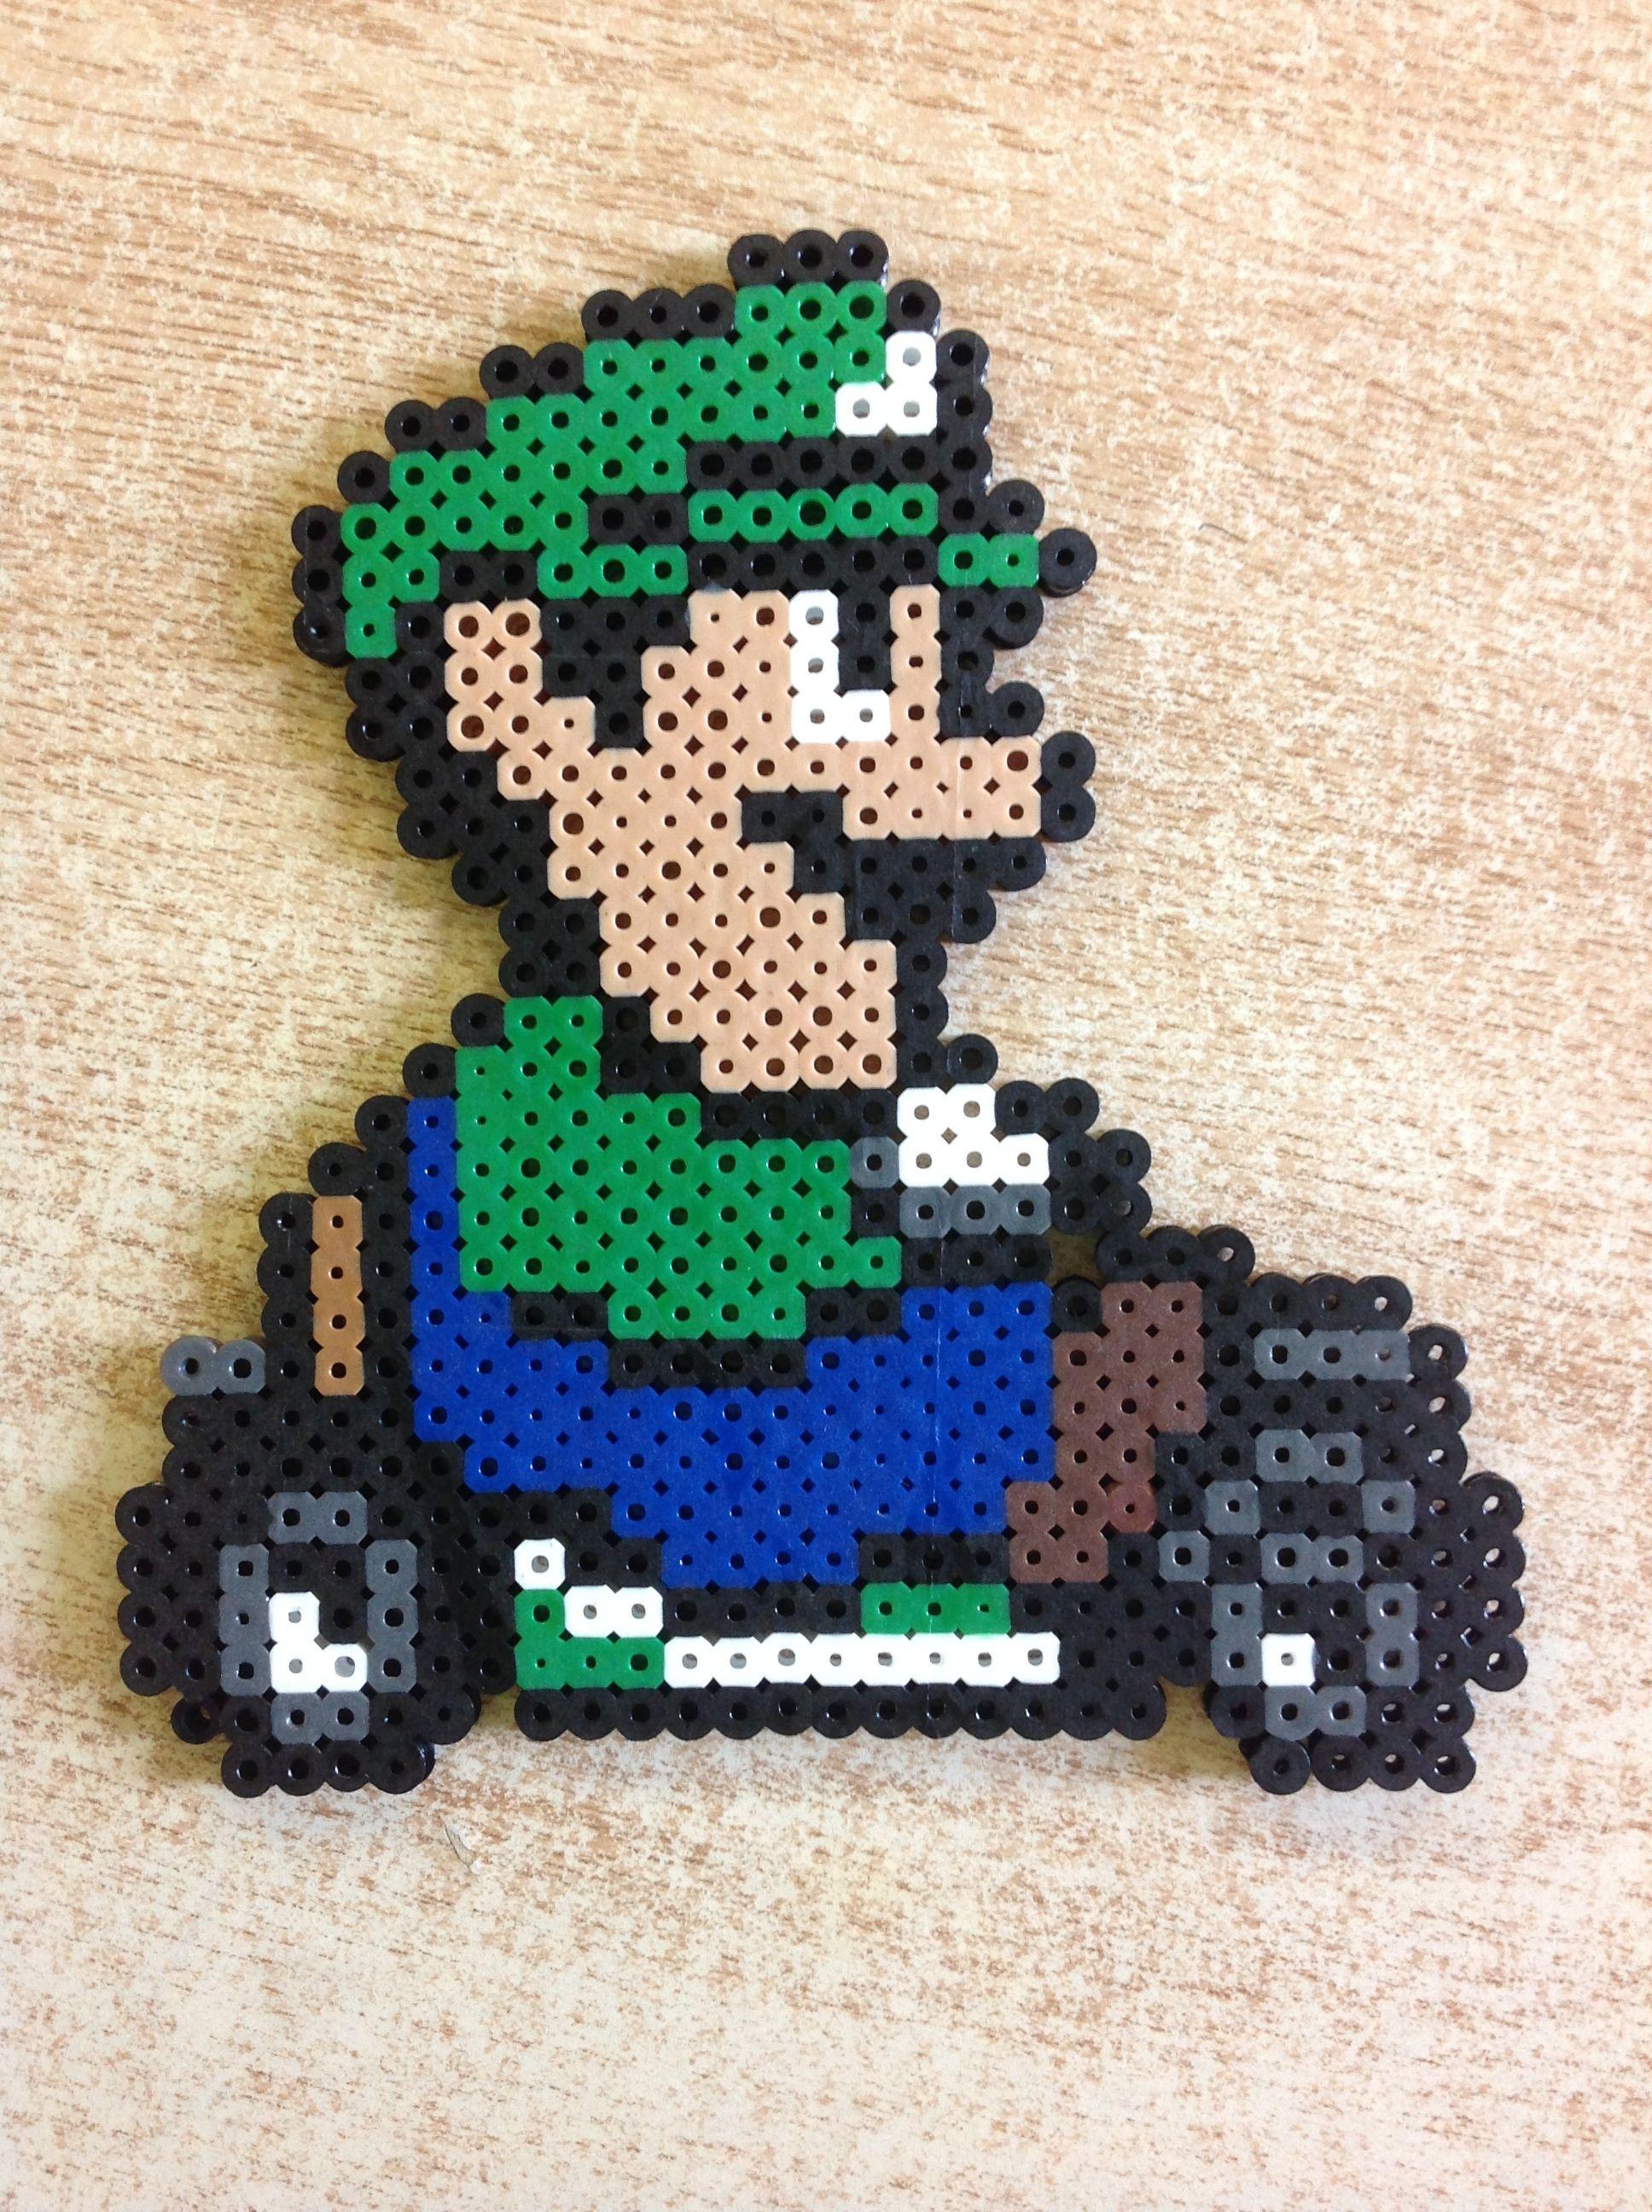 Mario Kart 64 Luigi Perler Bead Art Perler Bead Patterns